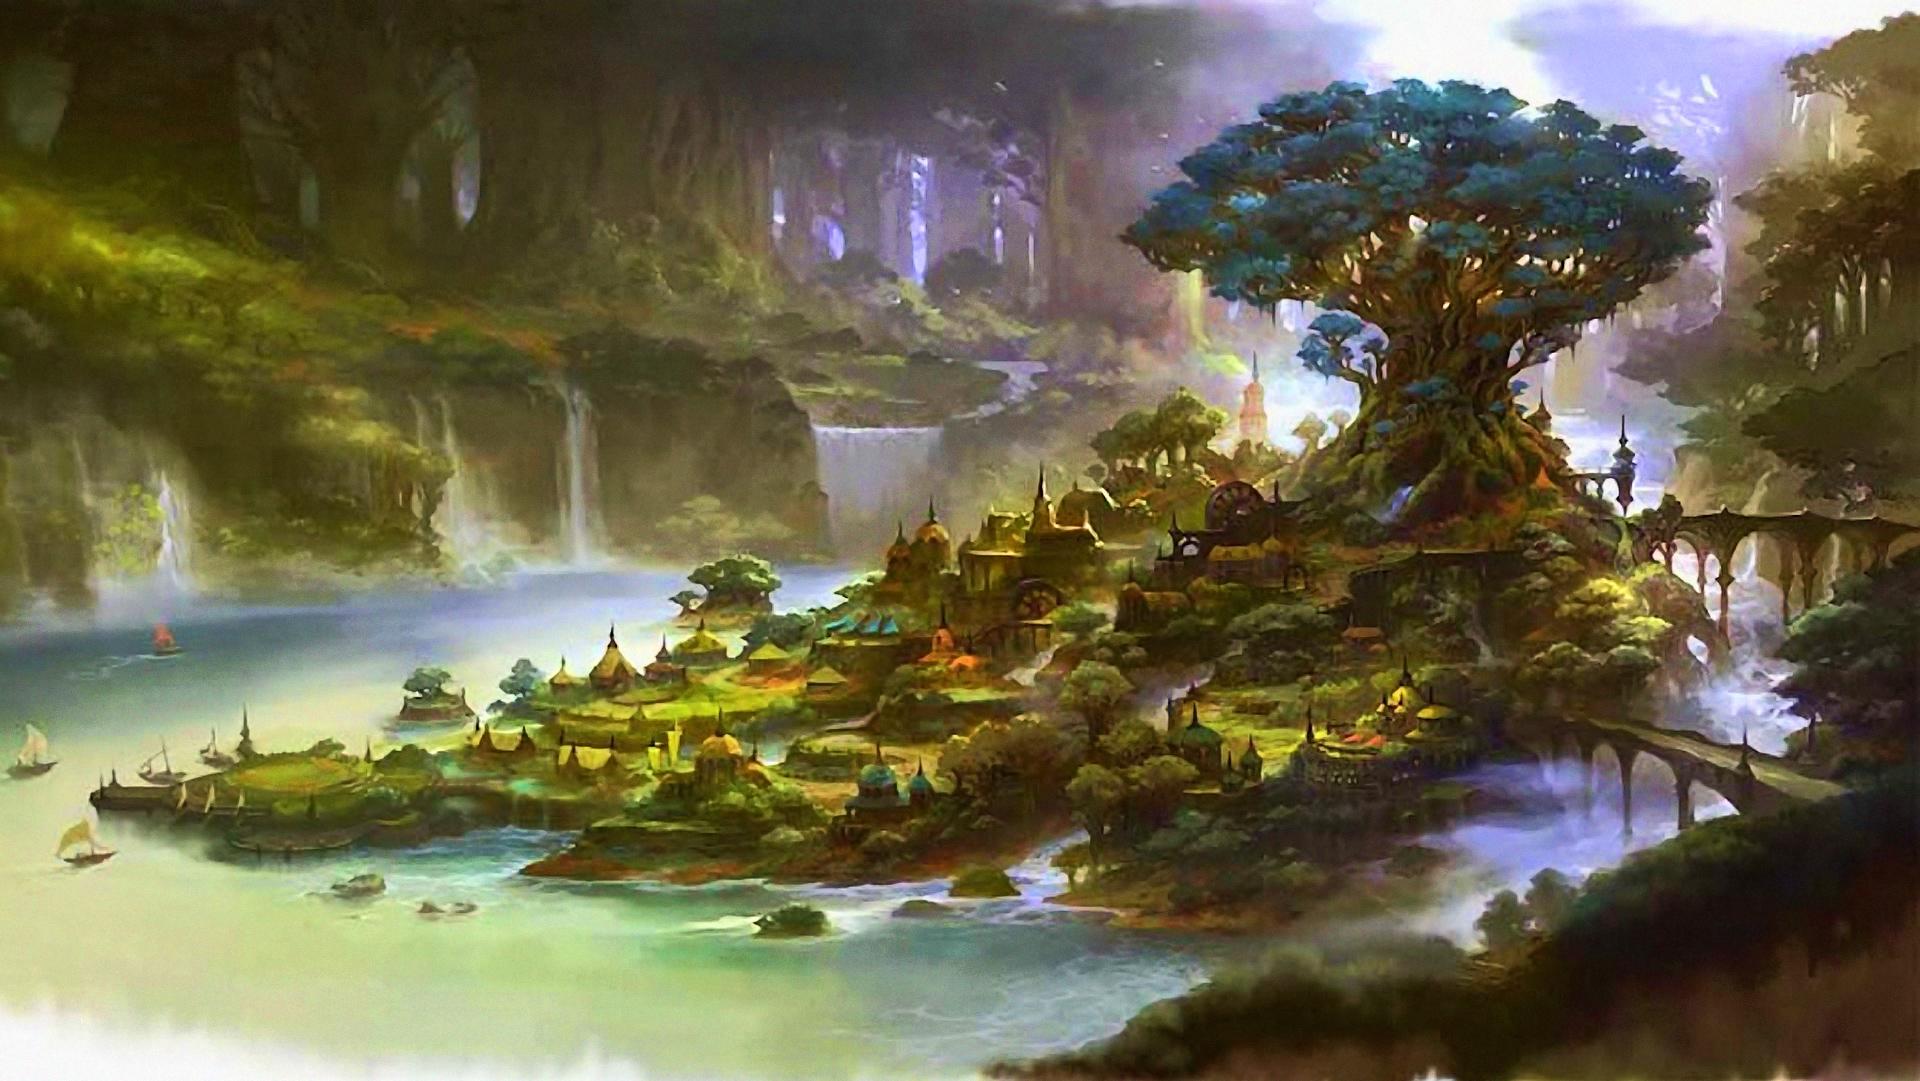 Final fantasy xiv wallpapers pictures images - Fantasy desktop pictures ...